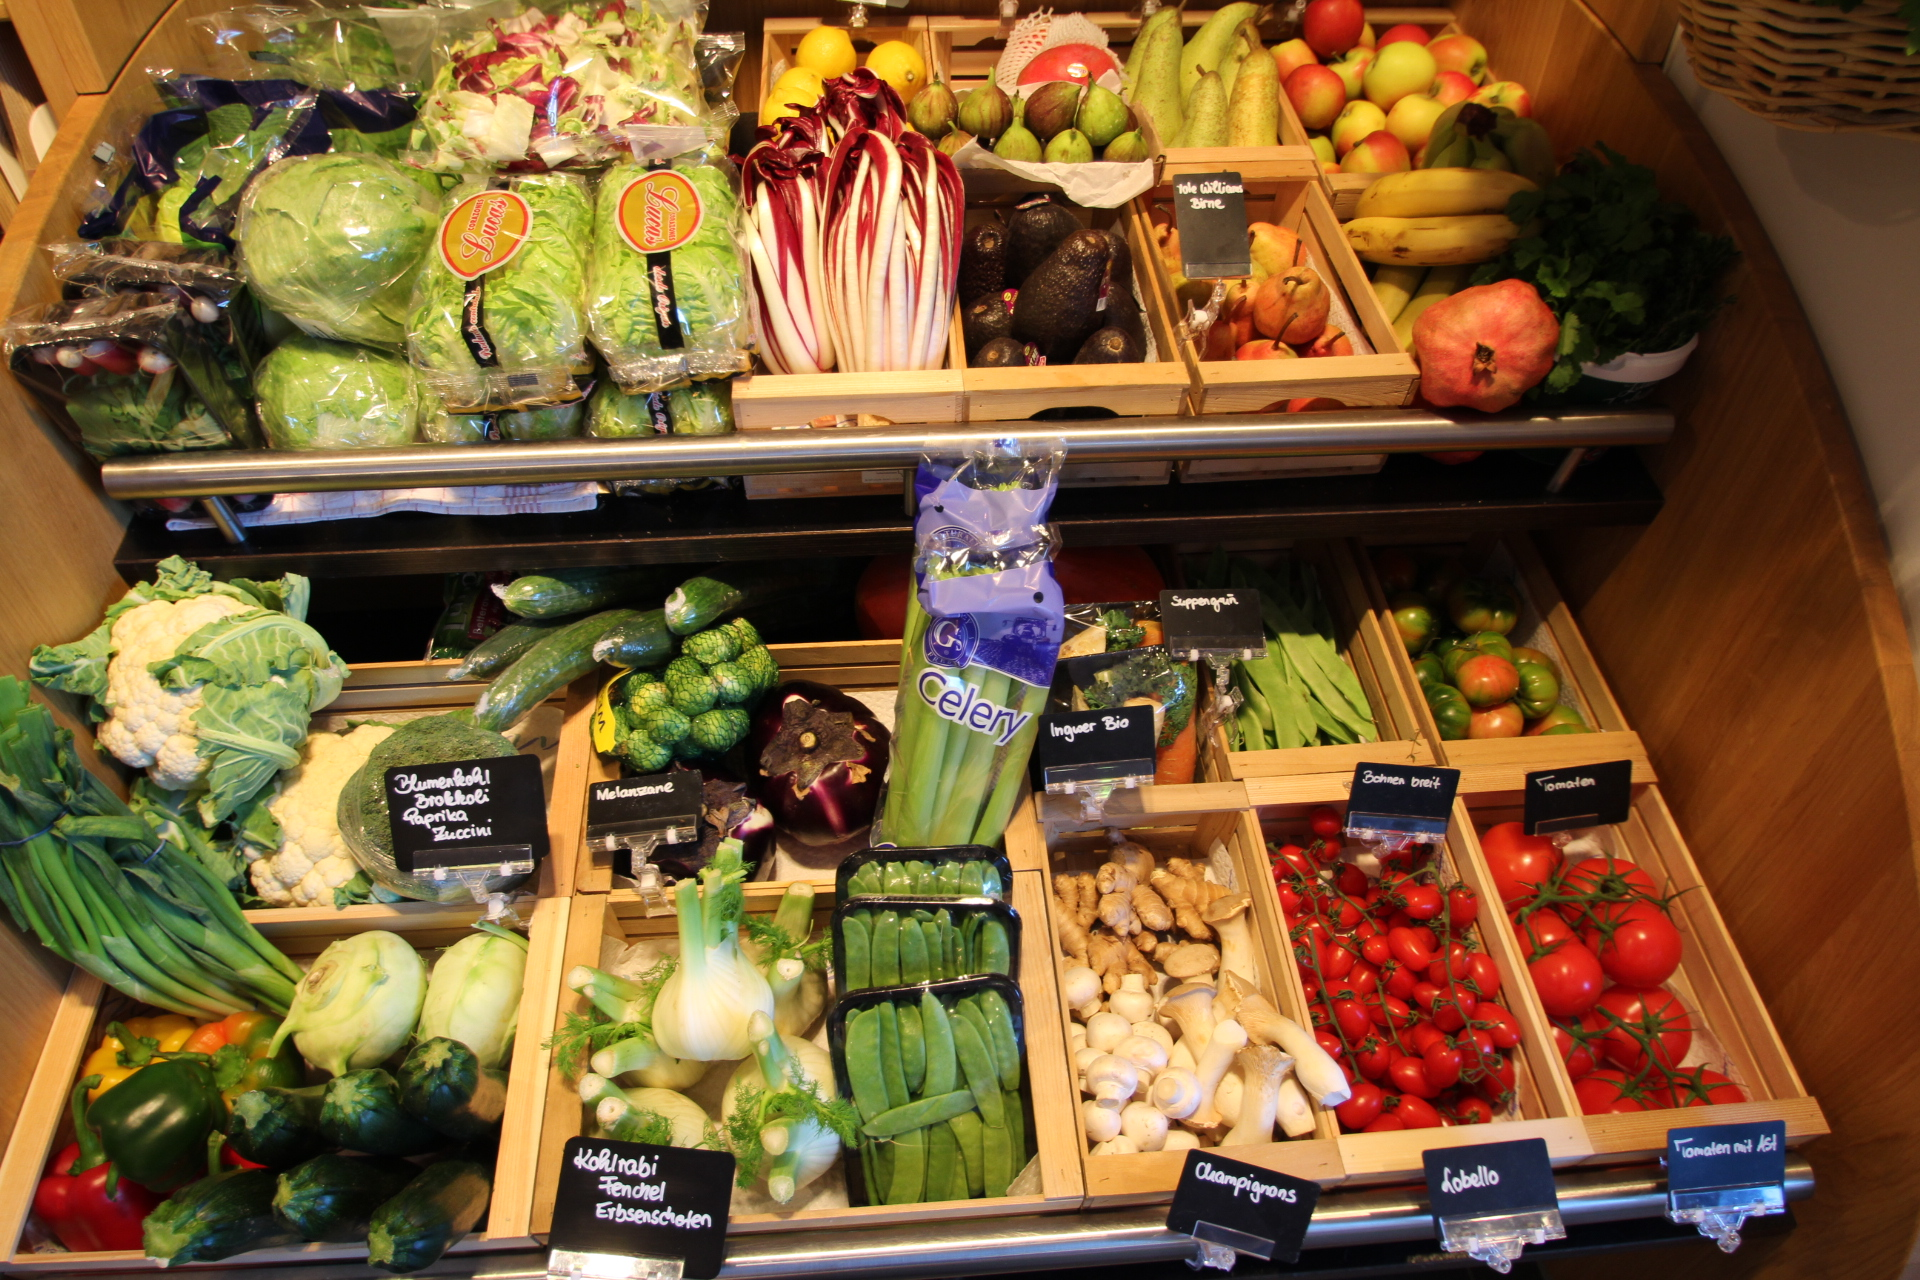 Gemüse-Hagen-Feinkost